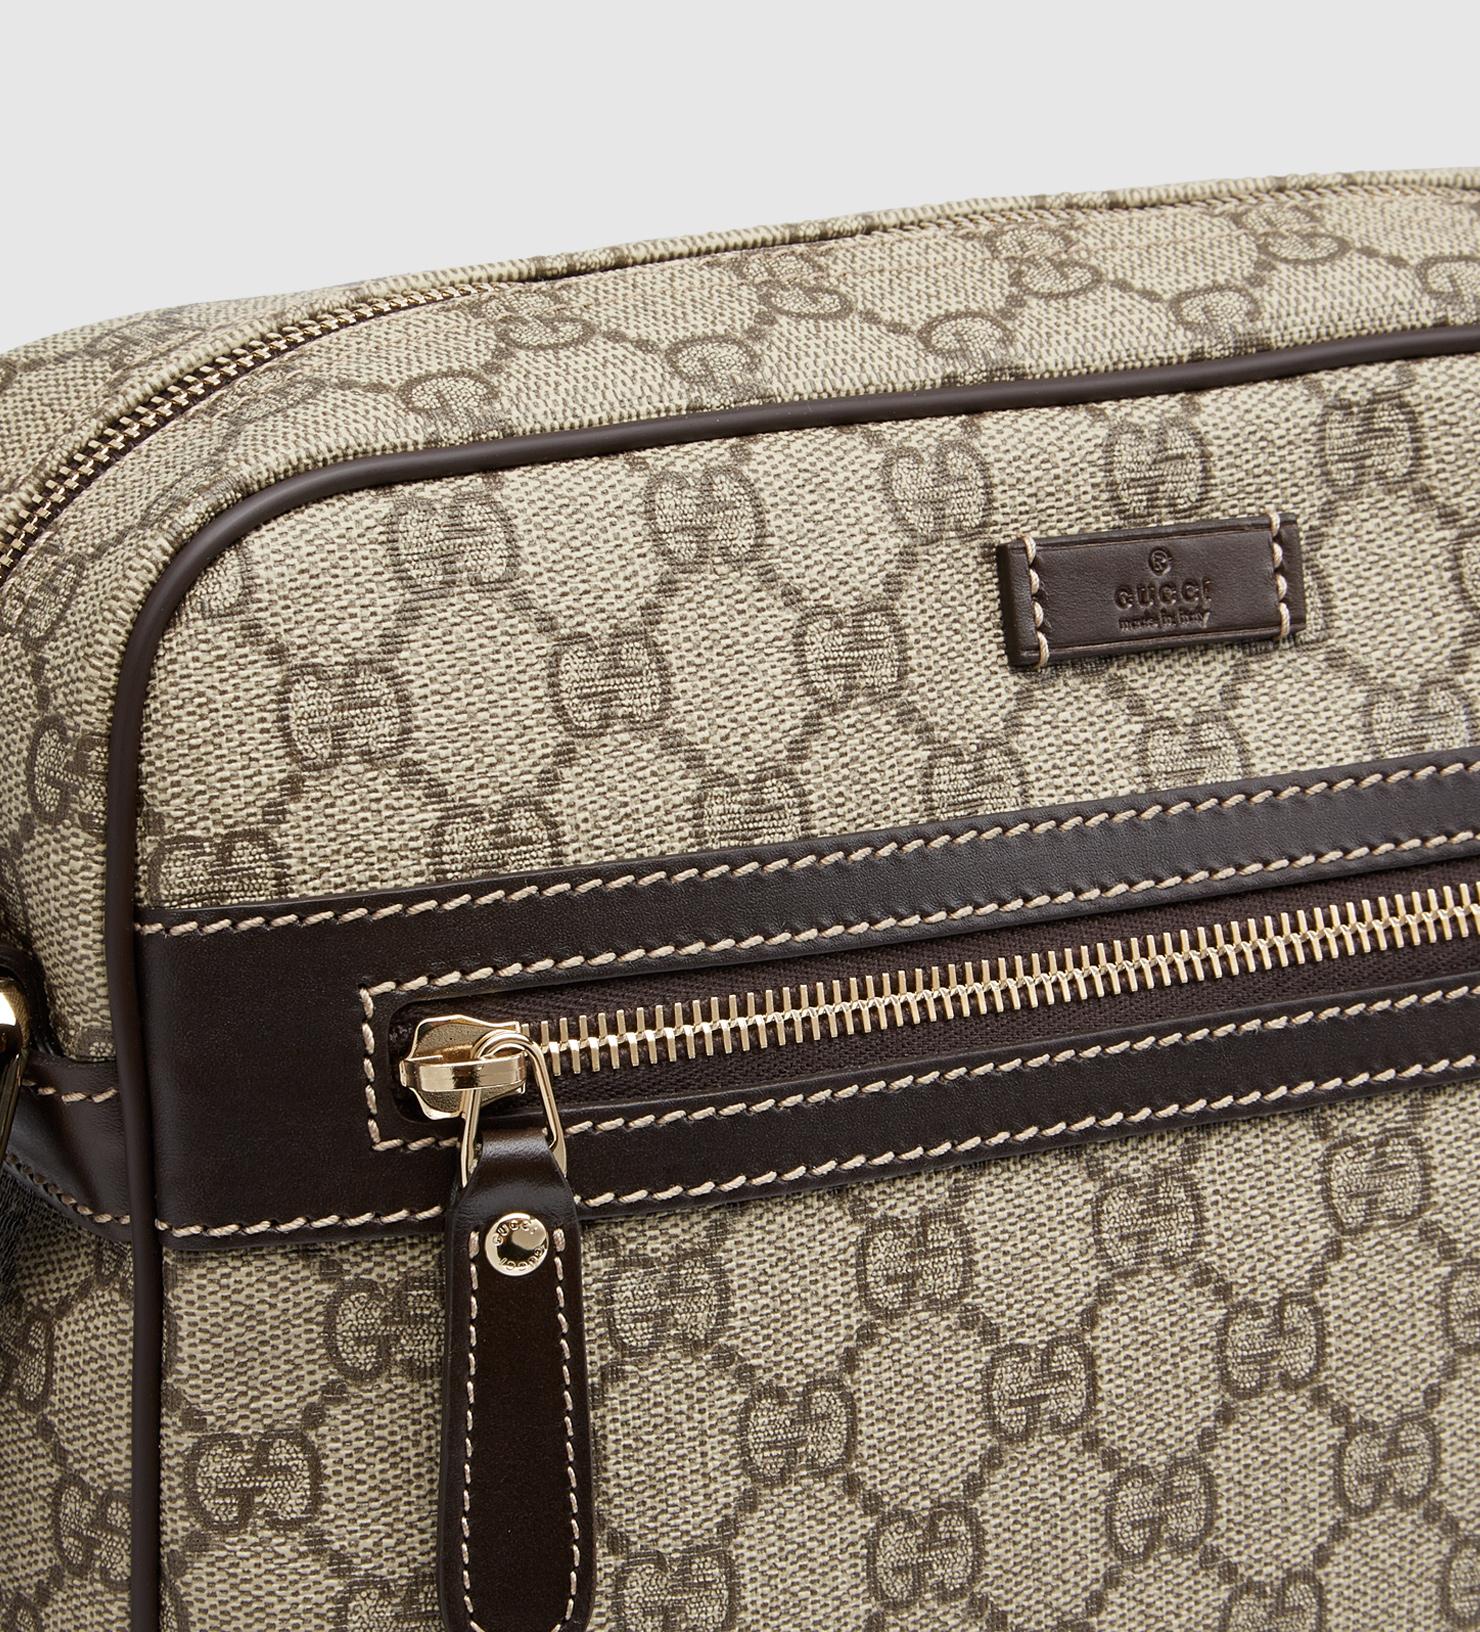 4d892abc3 Gucci Gg Supreme Shoulder Bag in Brown for Men - Lyst